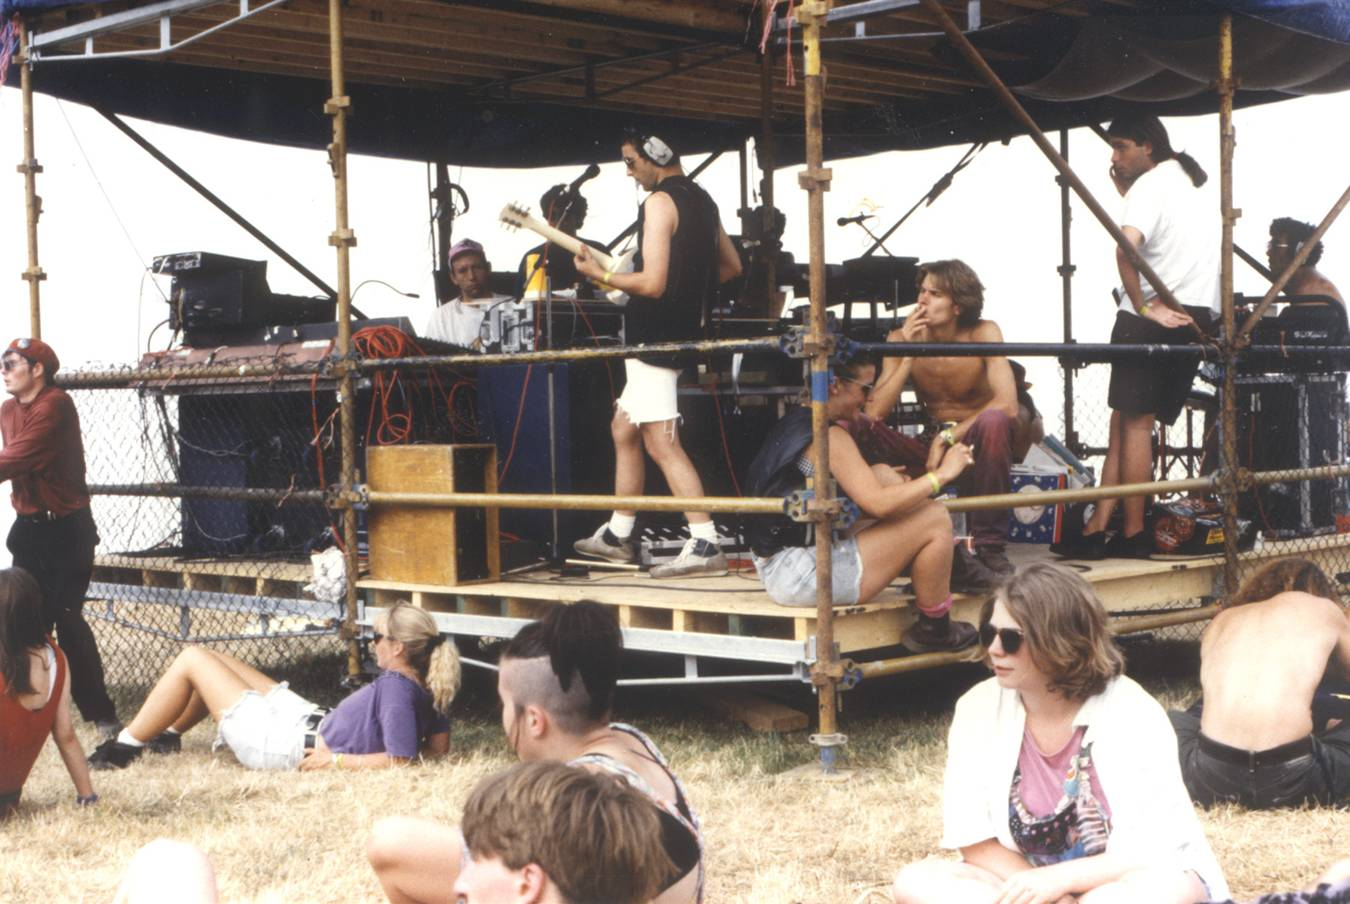 1992 Glastonbury Festival Funktion-One